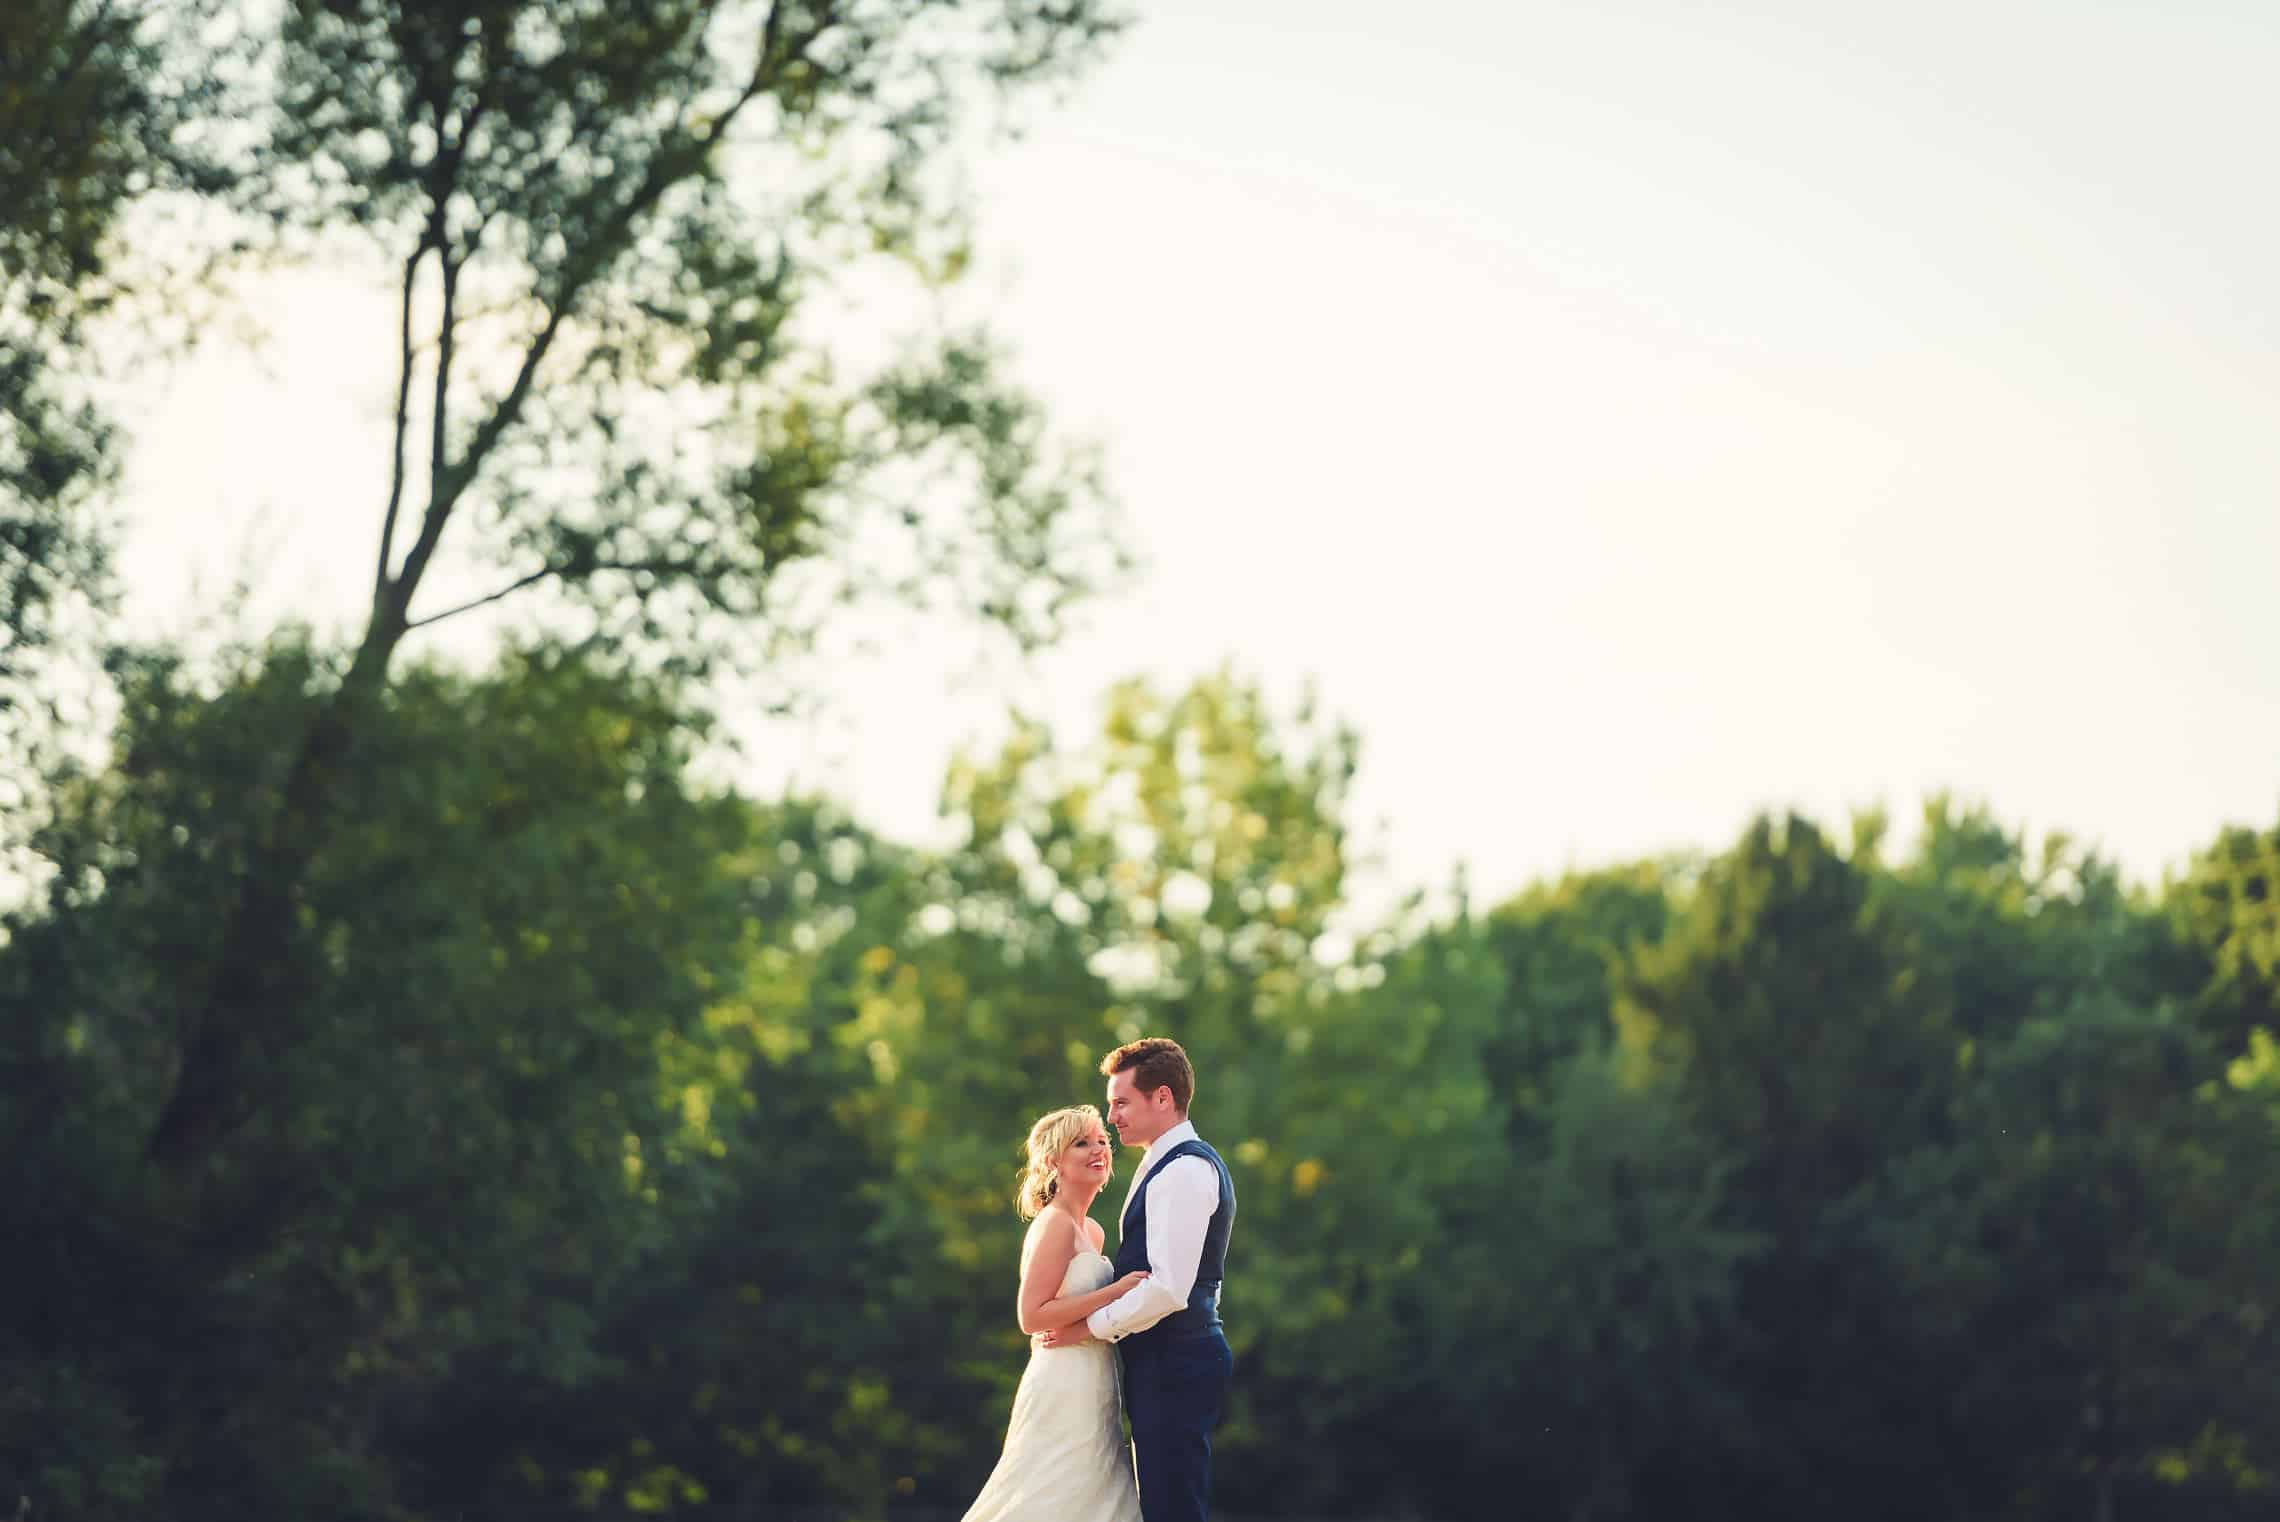 blake_hall_wedding_bc_justin_bailey_photography_038